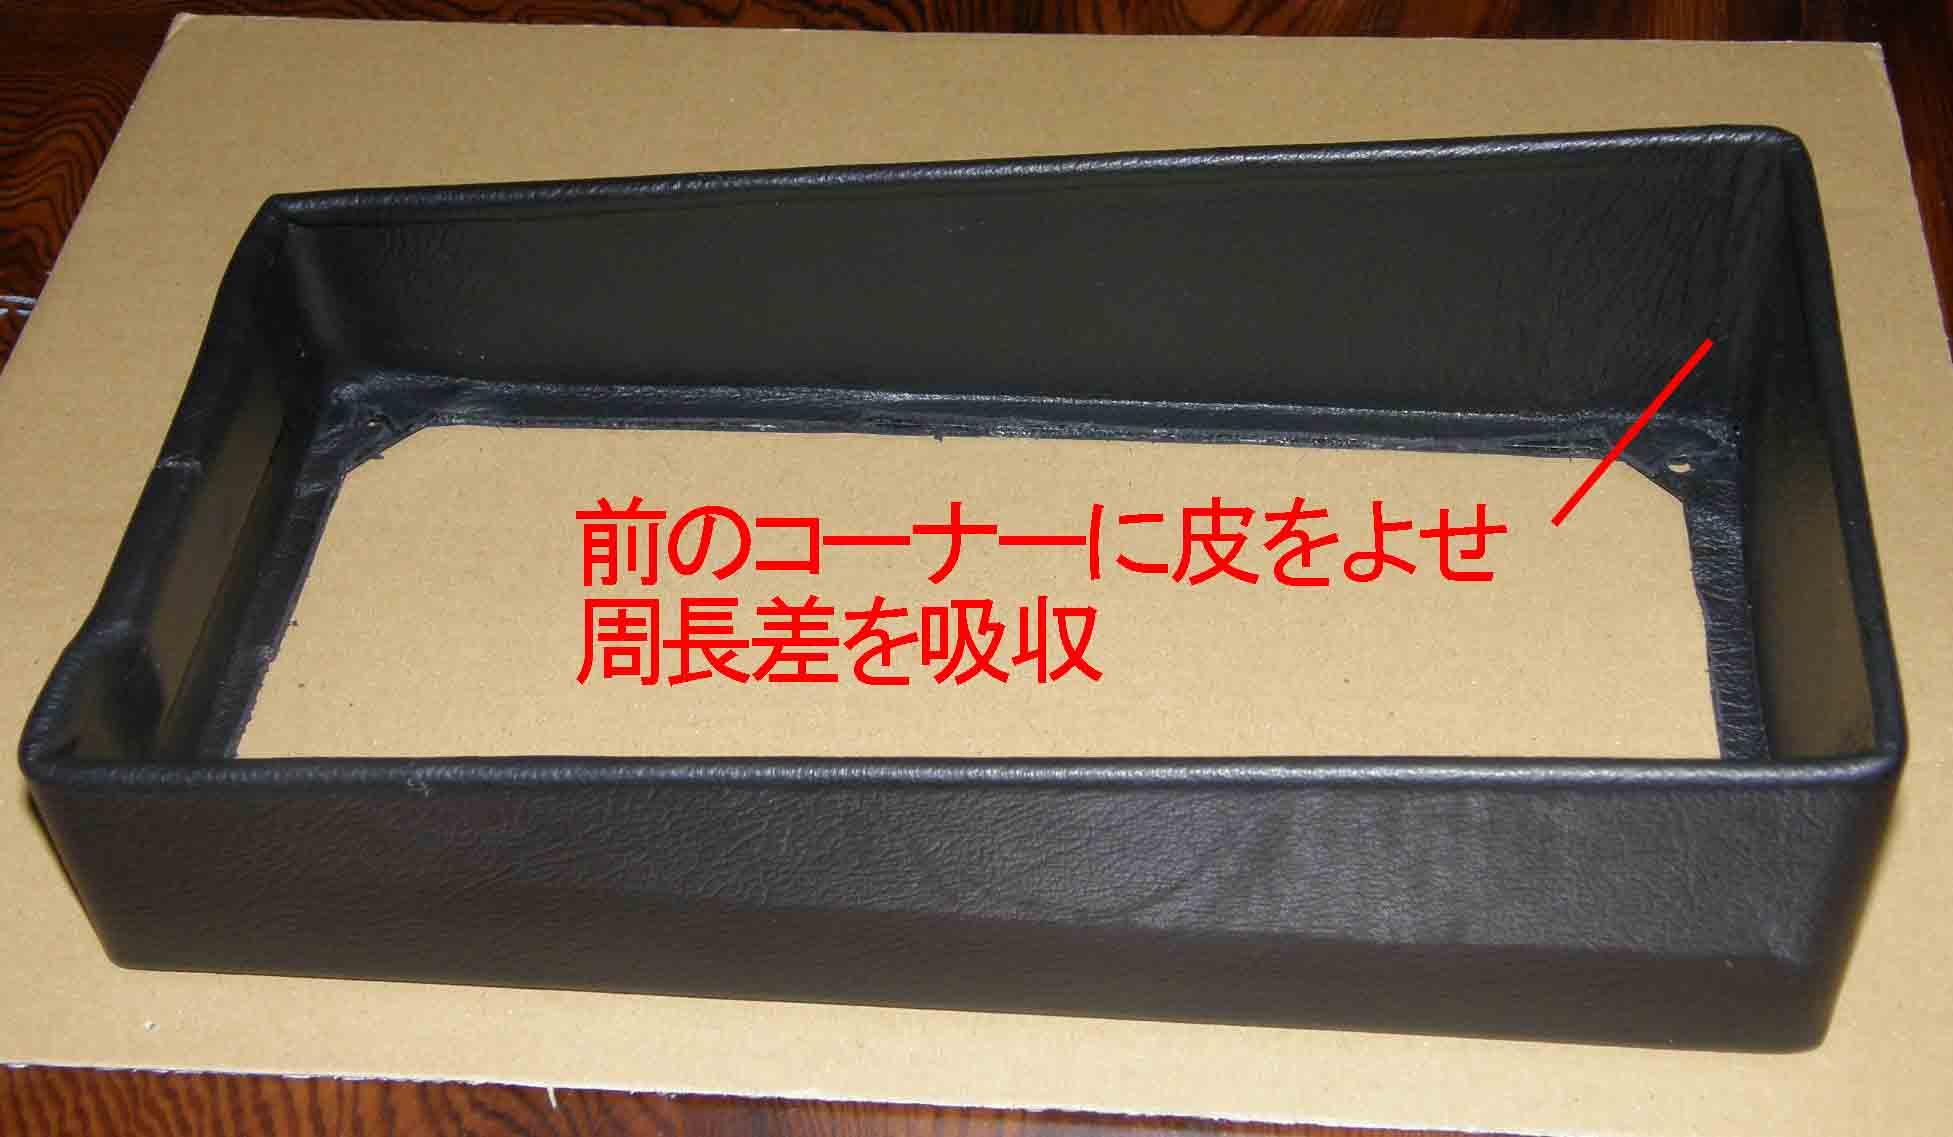 blogPaC270185.jpg